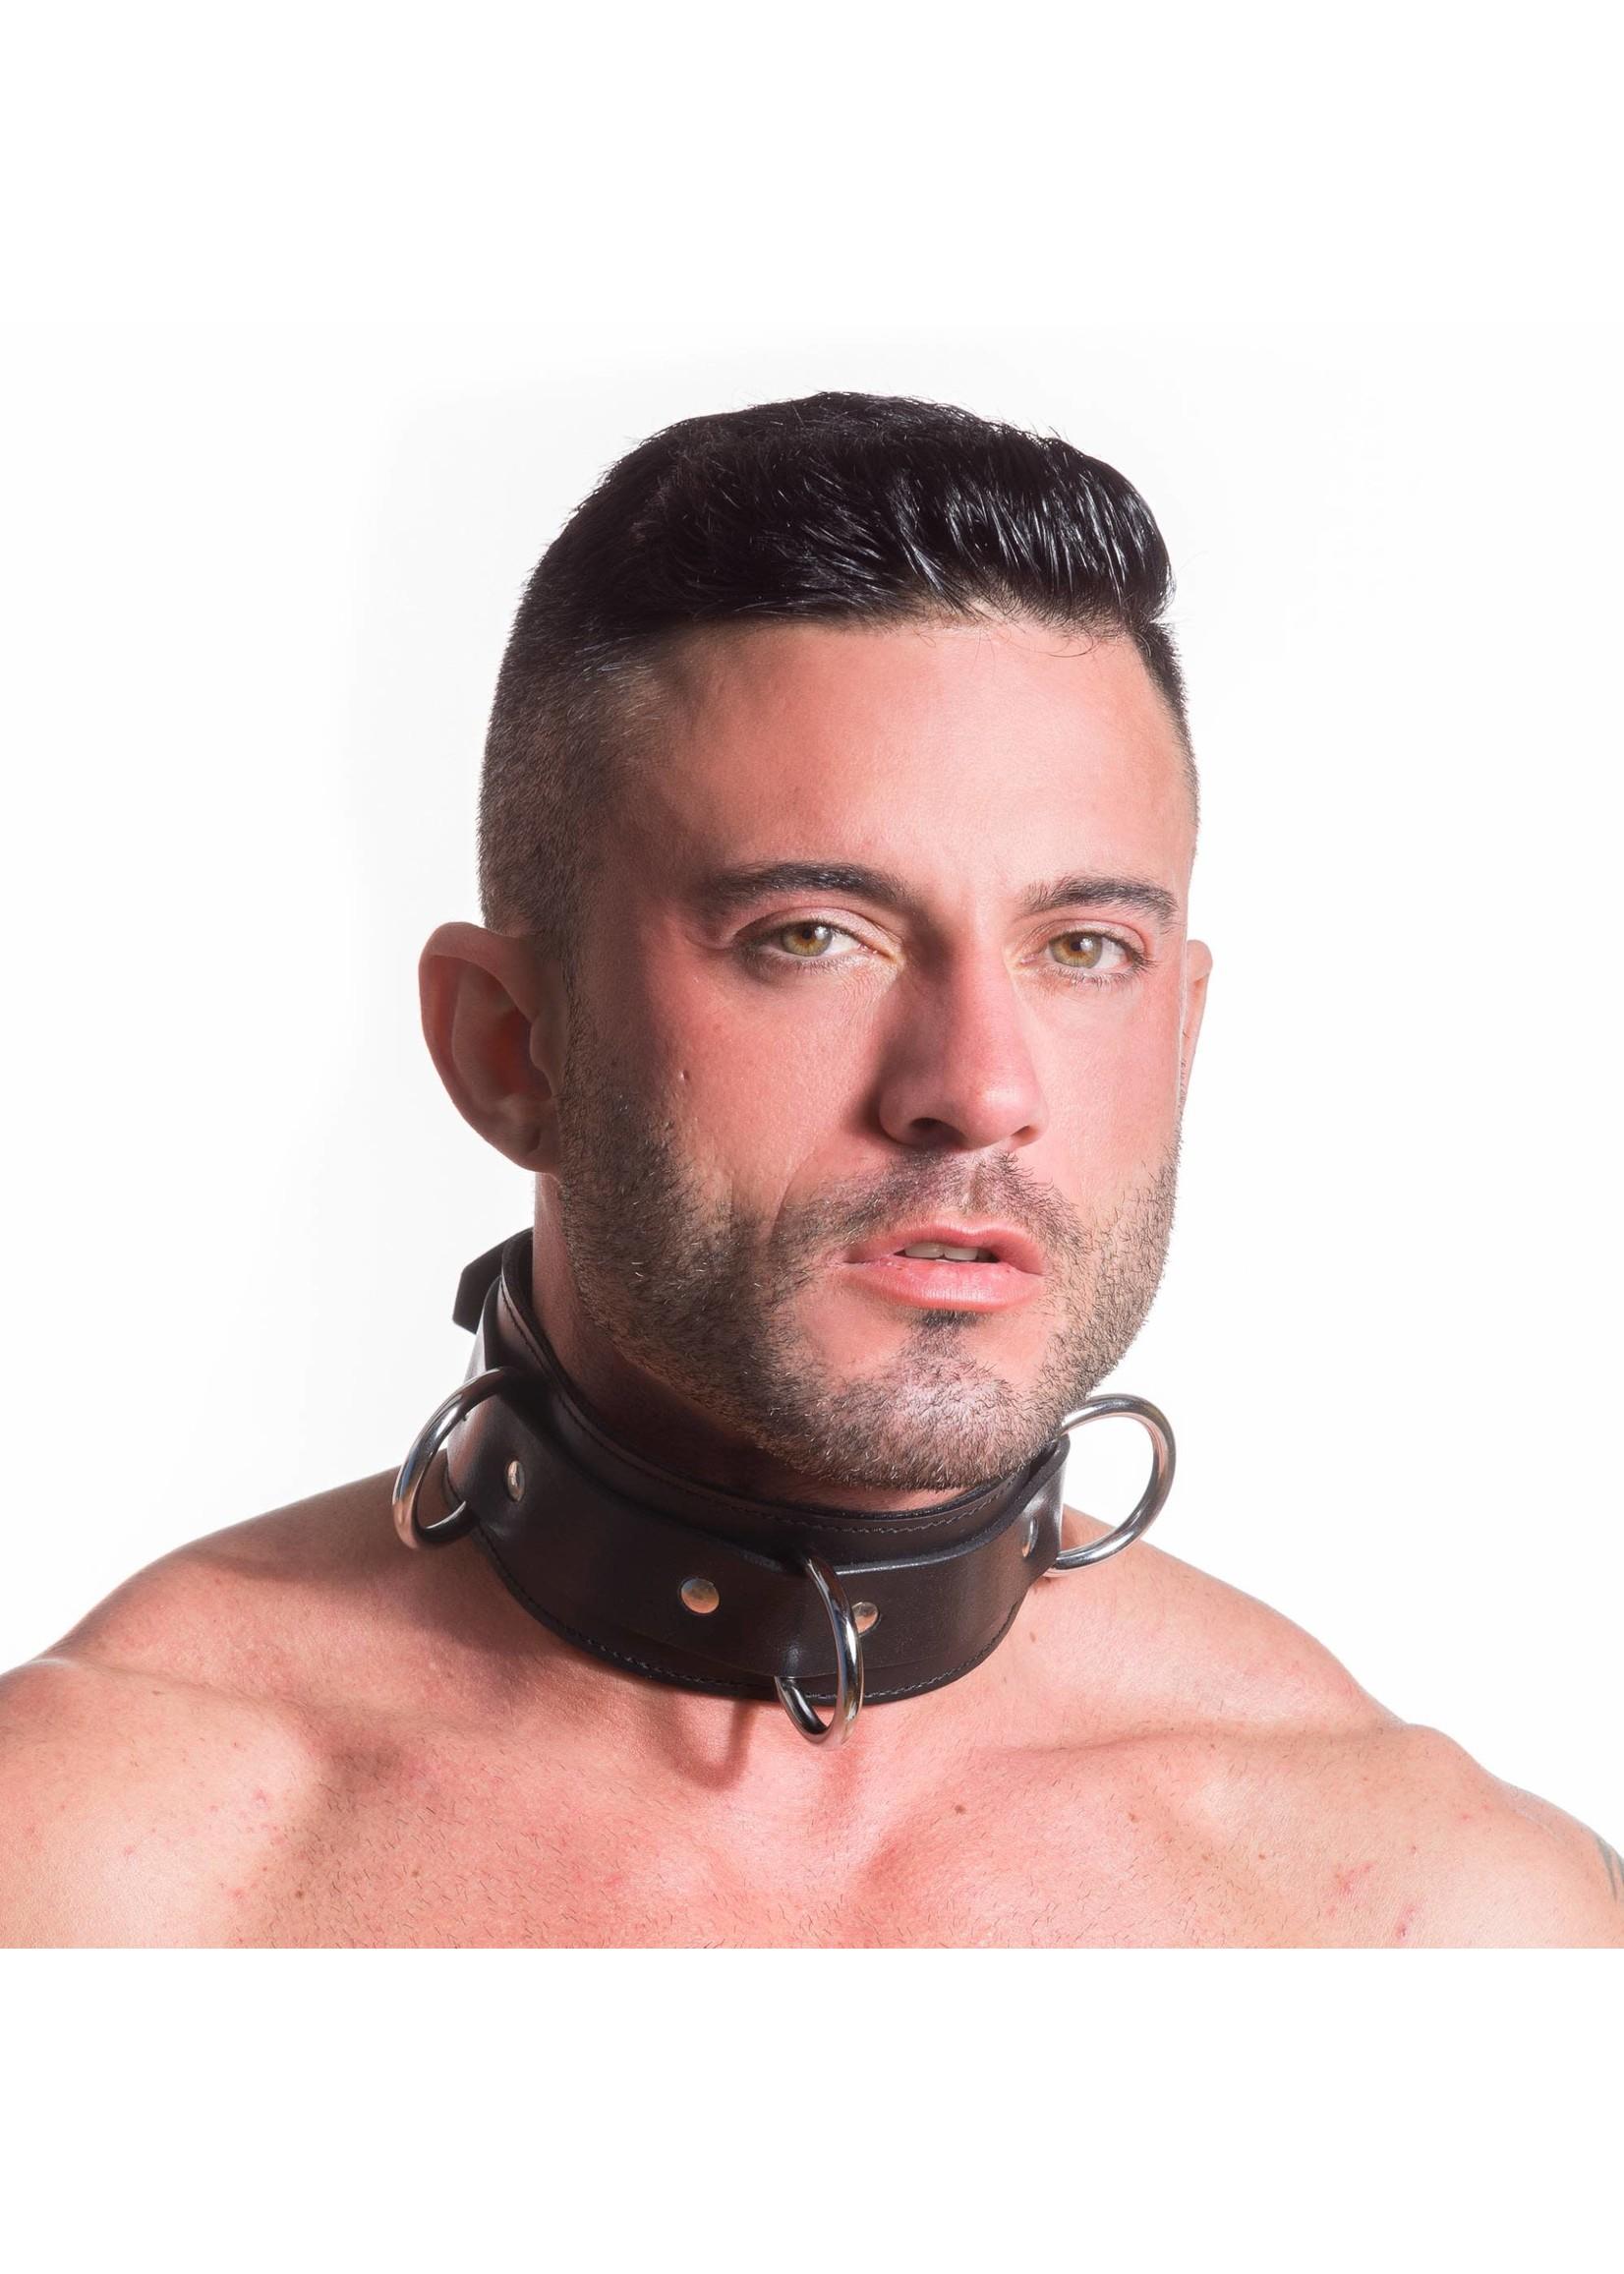 665 Leather 665 Locking Bondage Collar